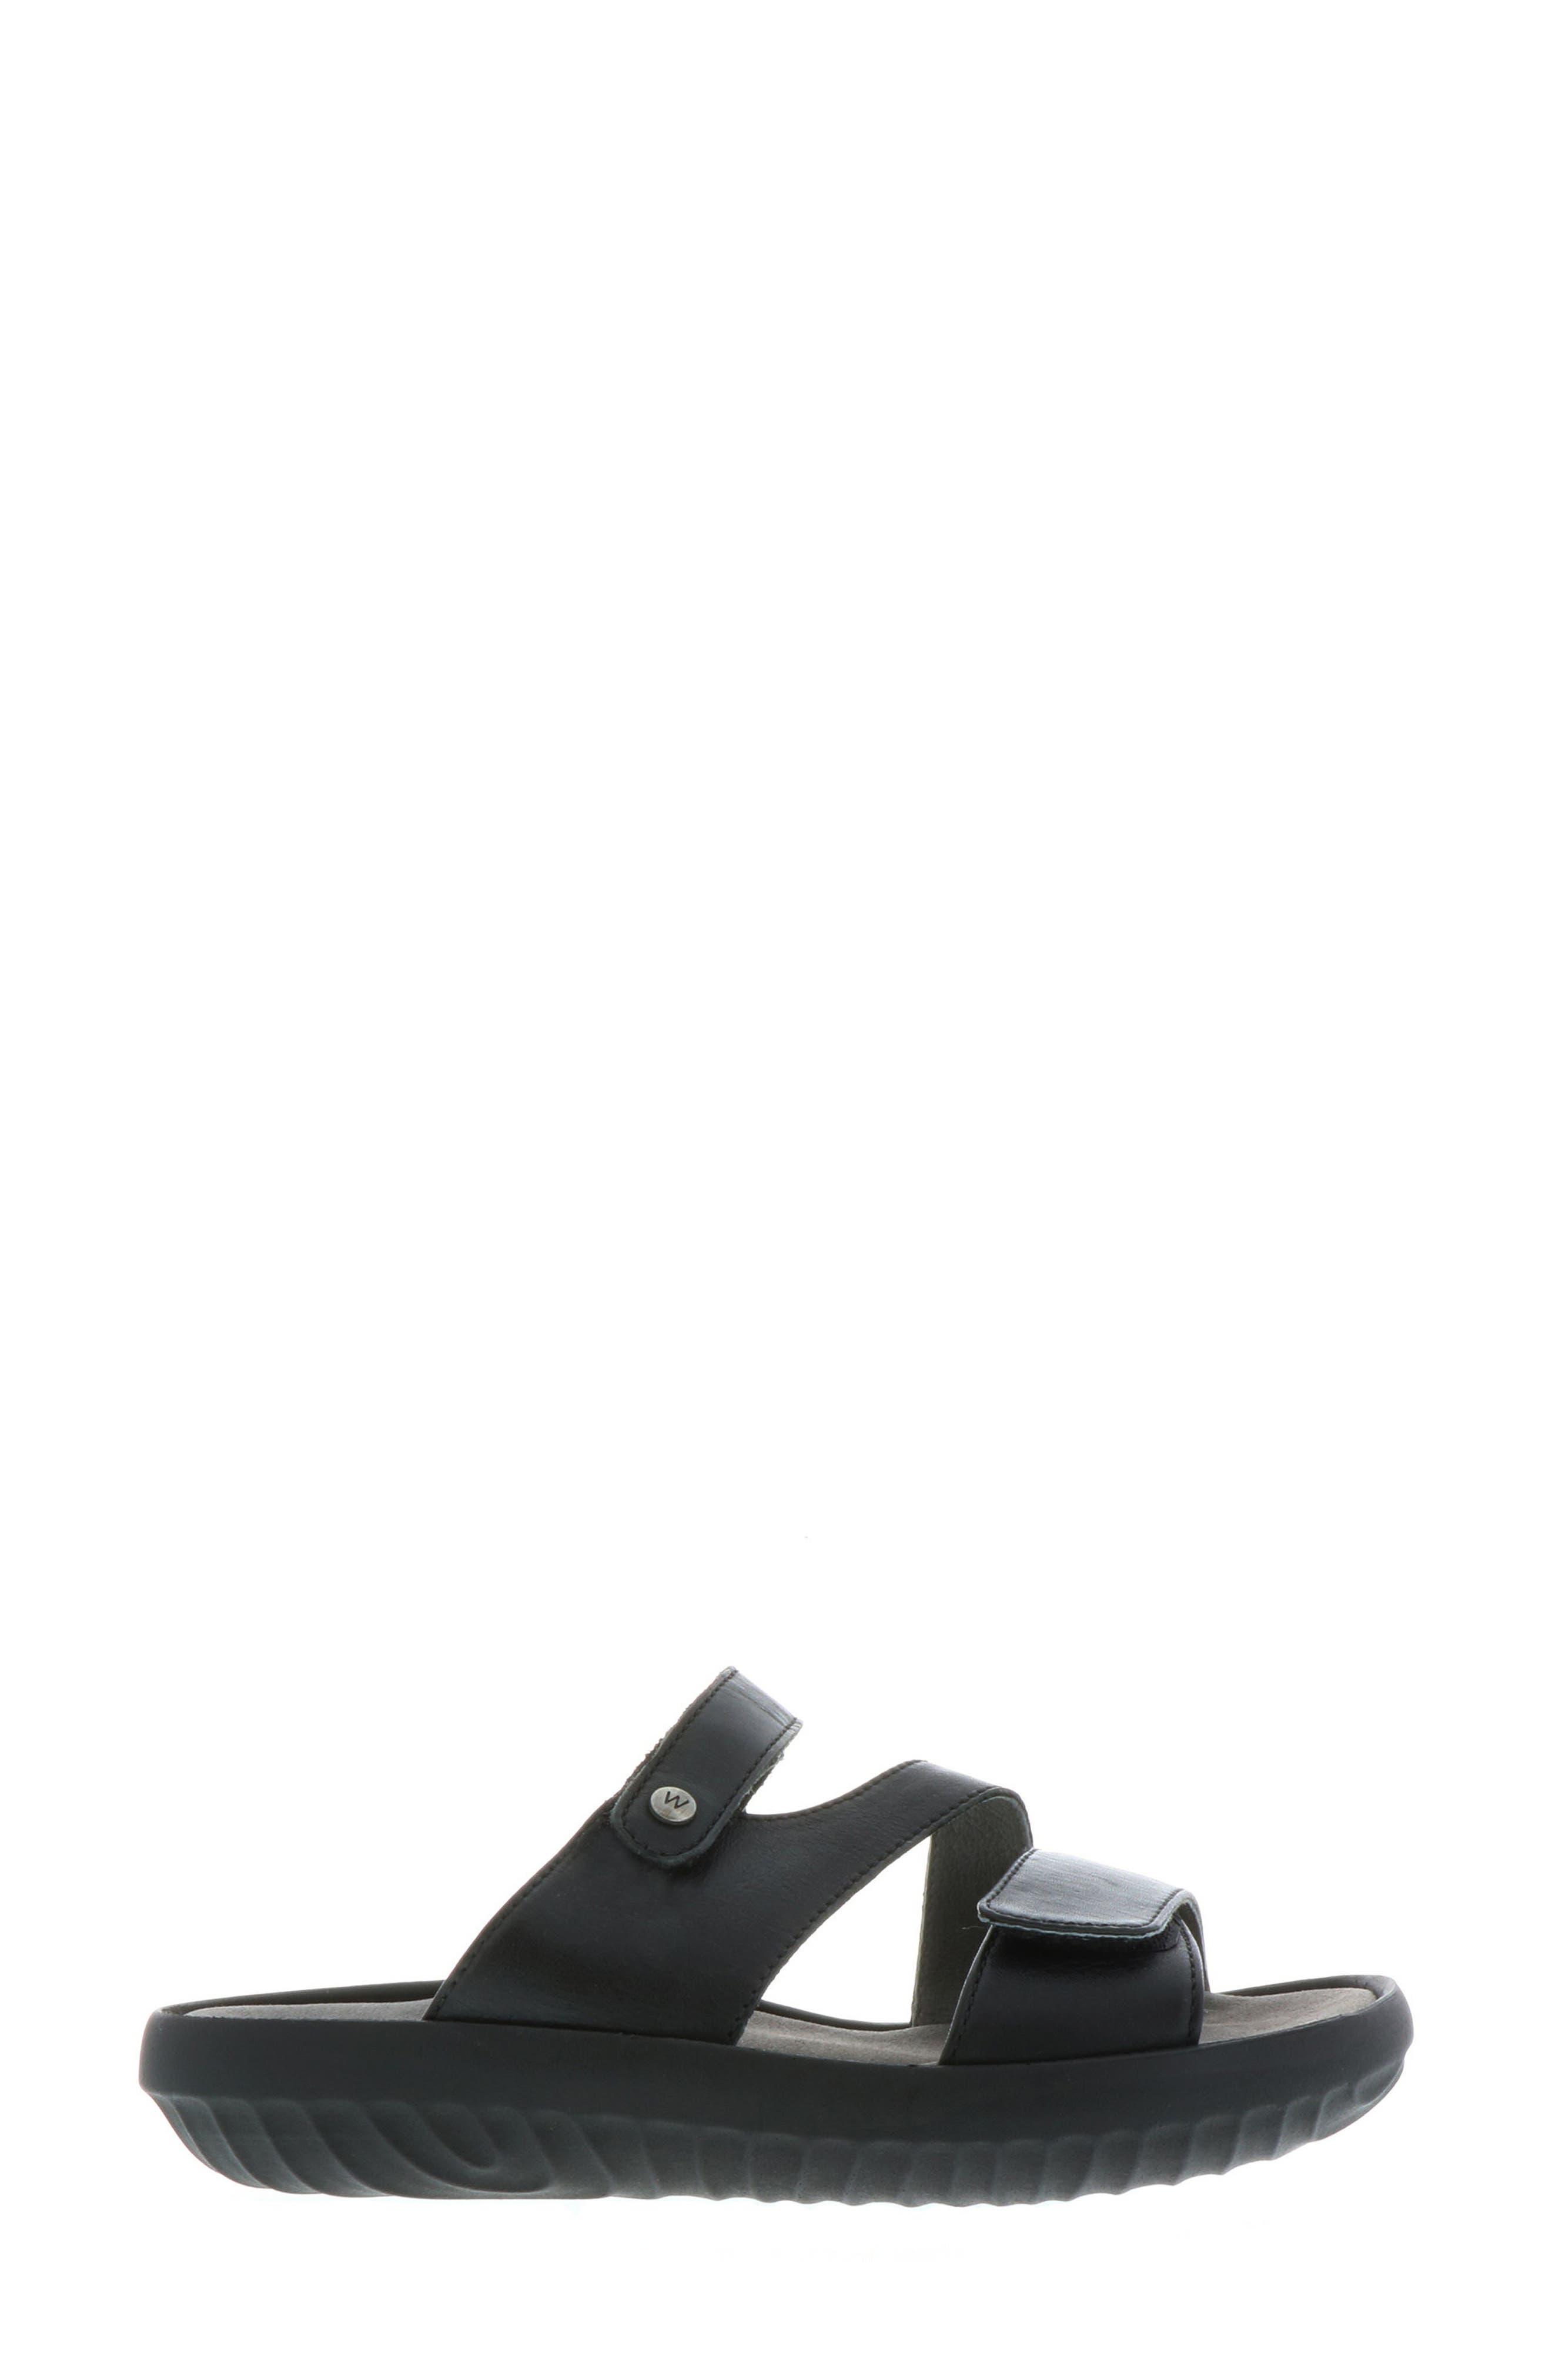 Sense Slide Sandal,                             Alternate thumbnail 3, color,                             BLACK